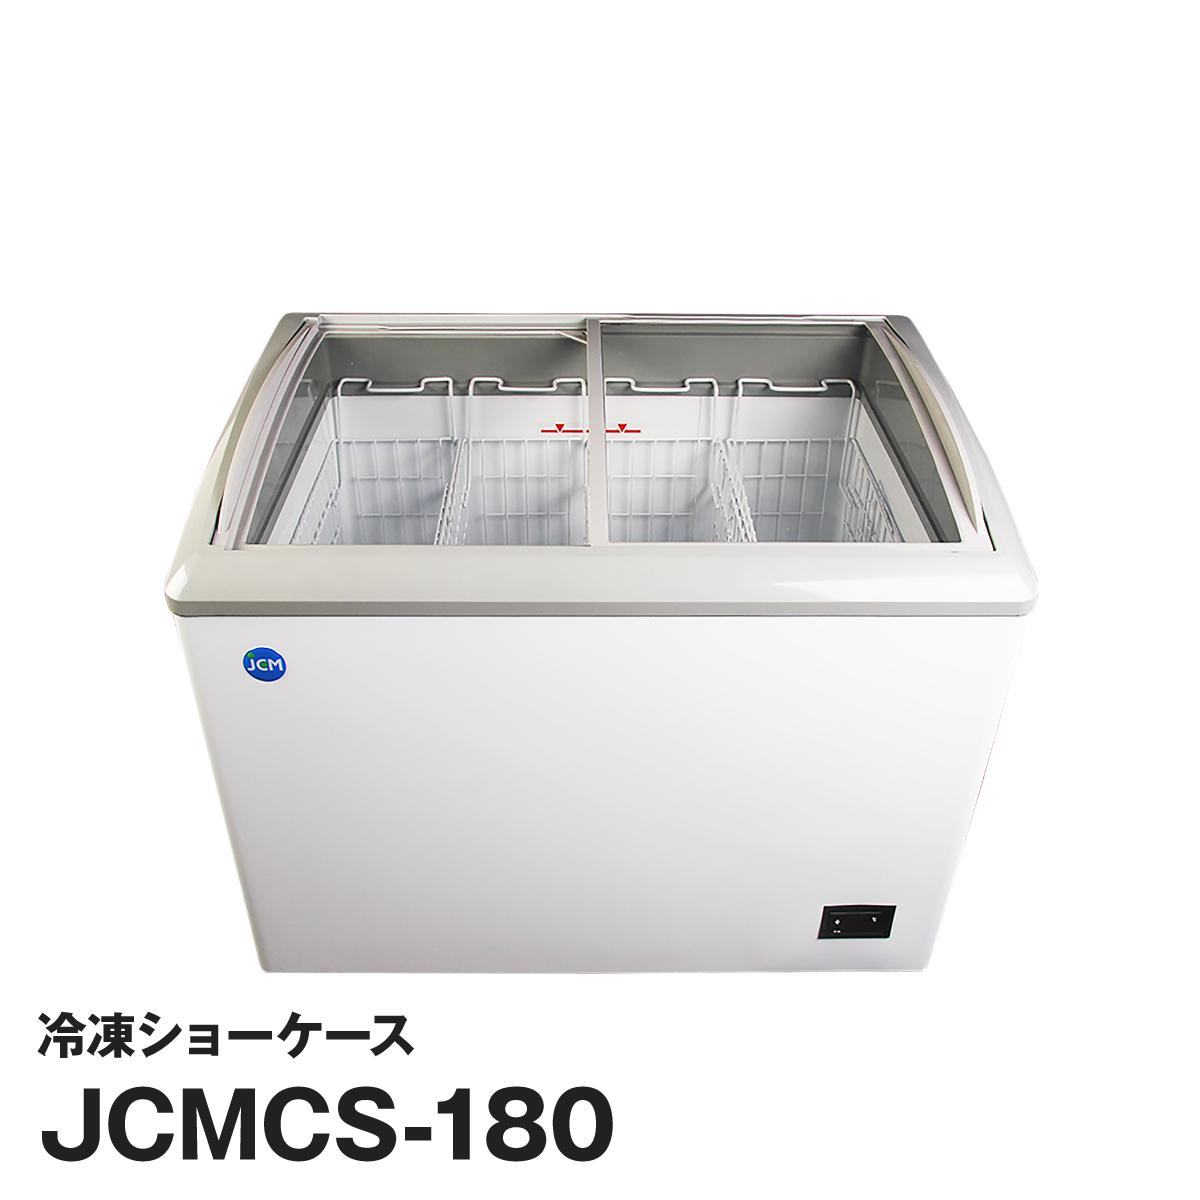 JCM社製 業務用 保冷庫 冷凍庫 103L スライド 冷凍ショーケース JCMCS-180 新品